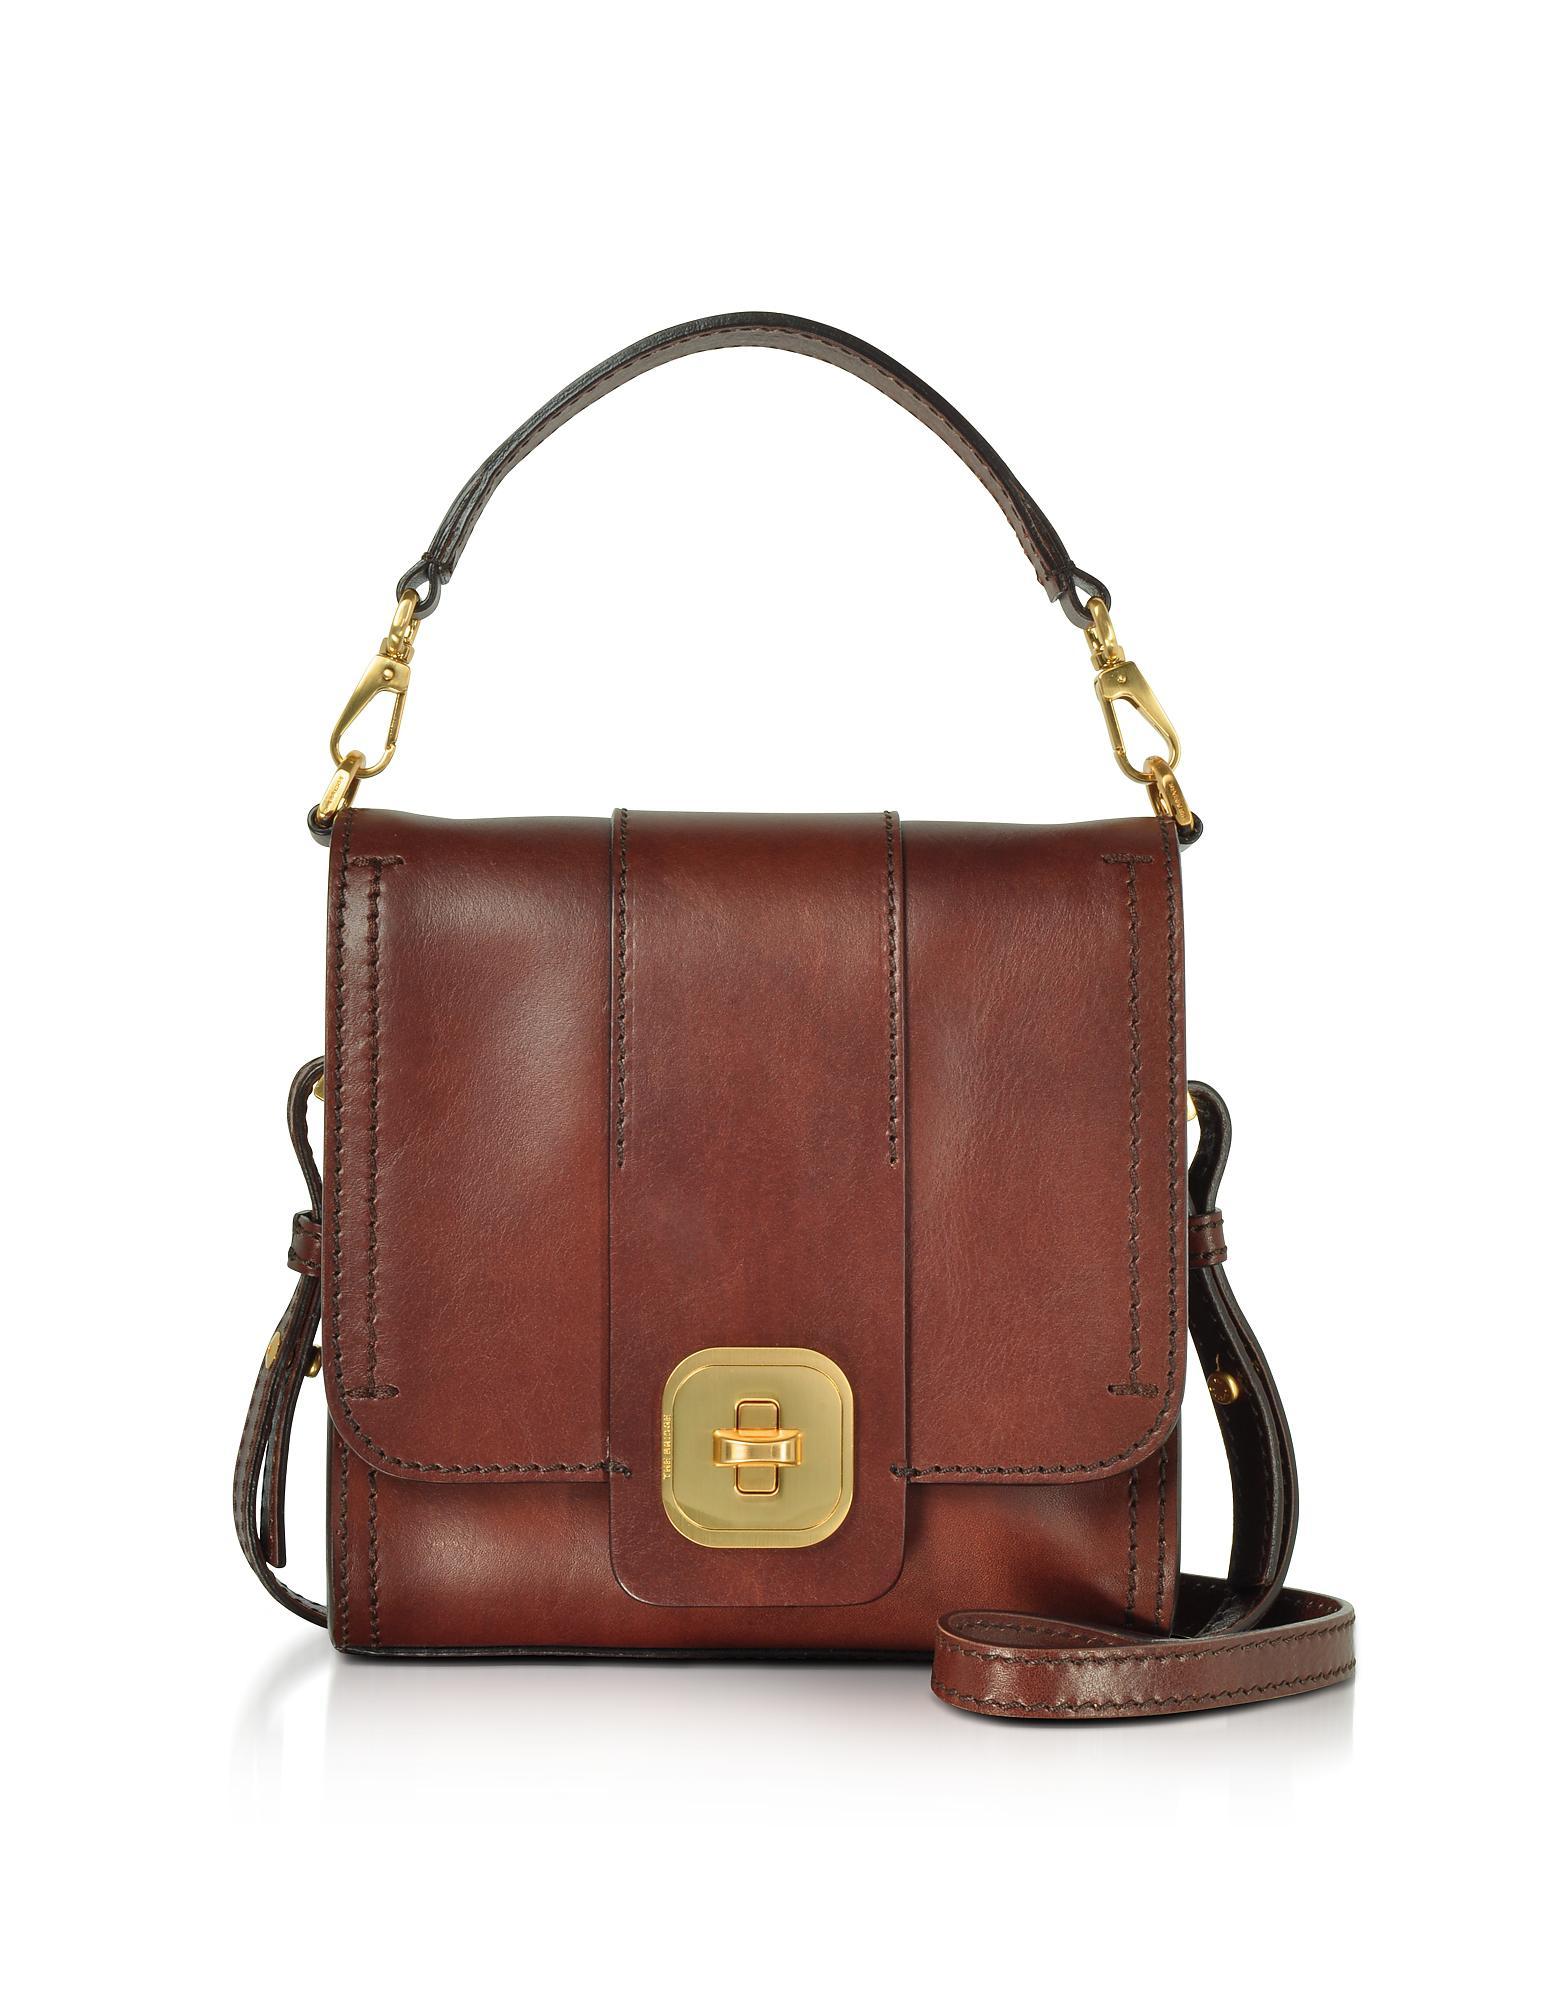 774672160a70 Lyst - The Bridge Genuine Leather Top Handle Crossbody Bag in Brown